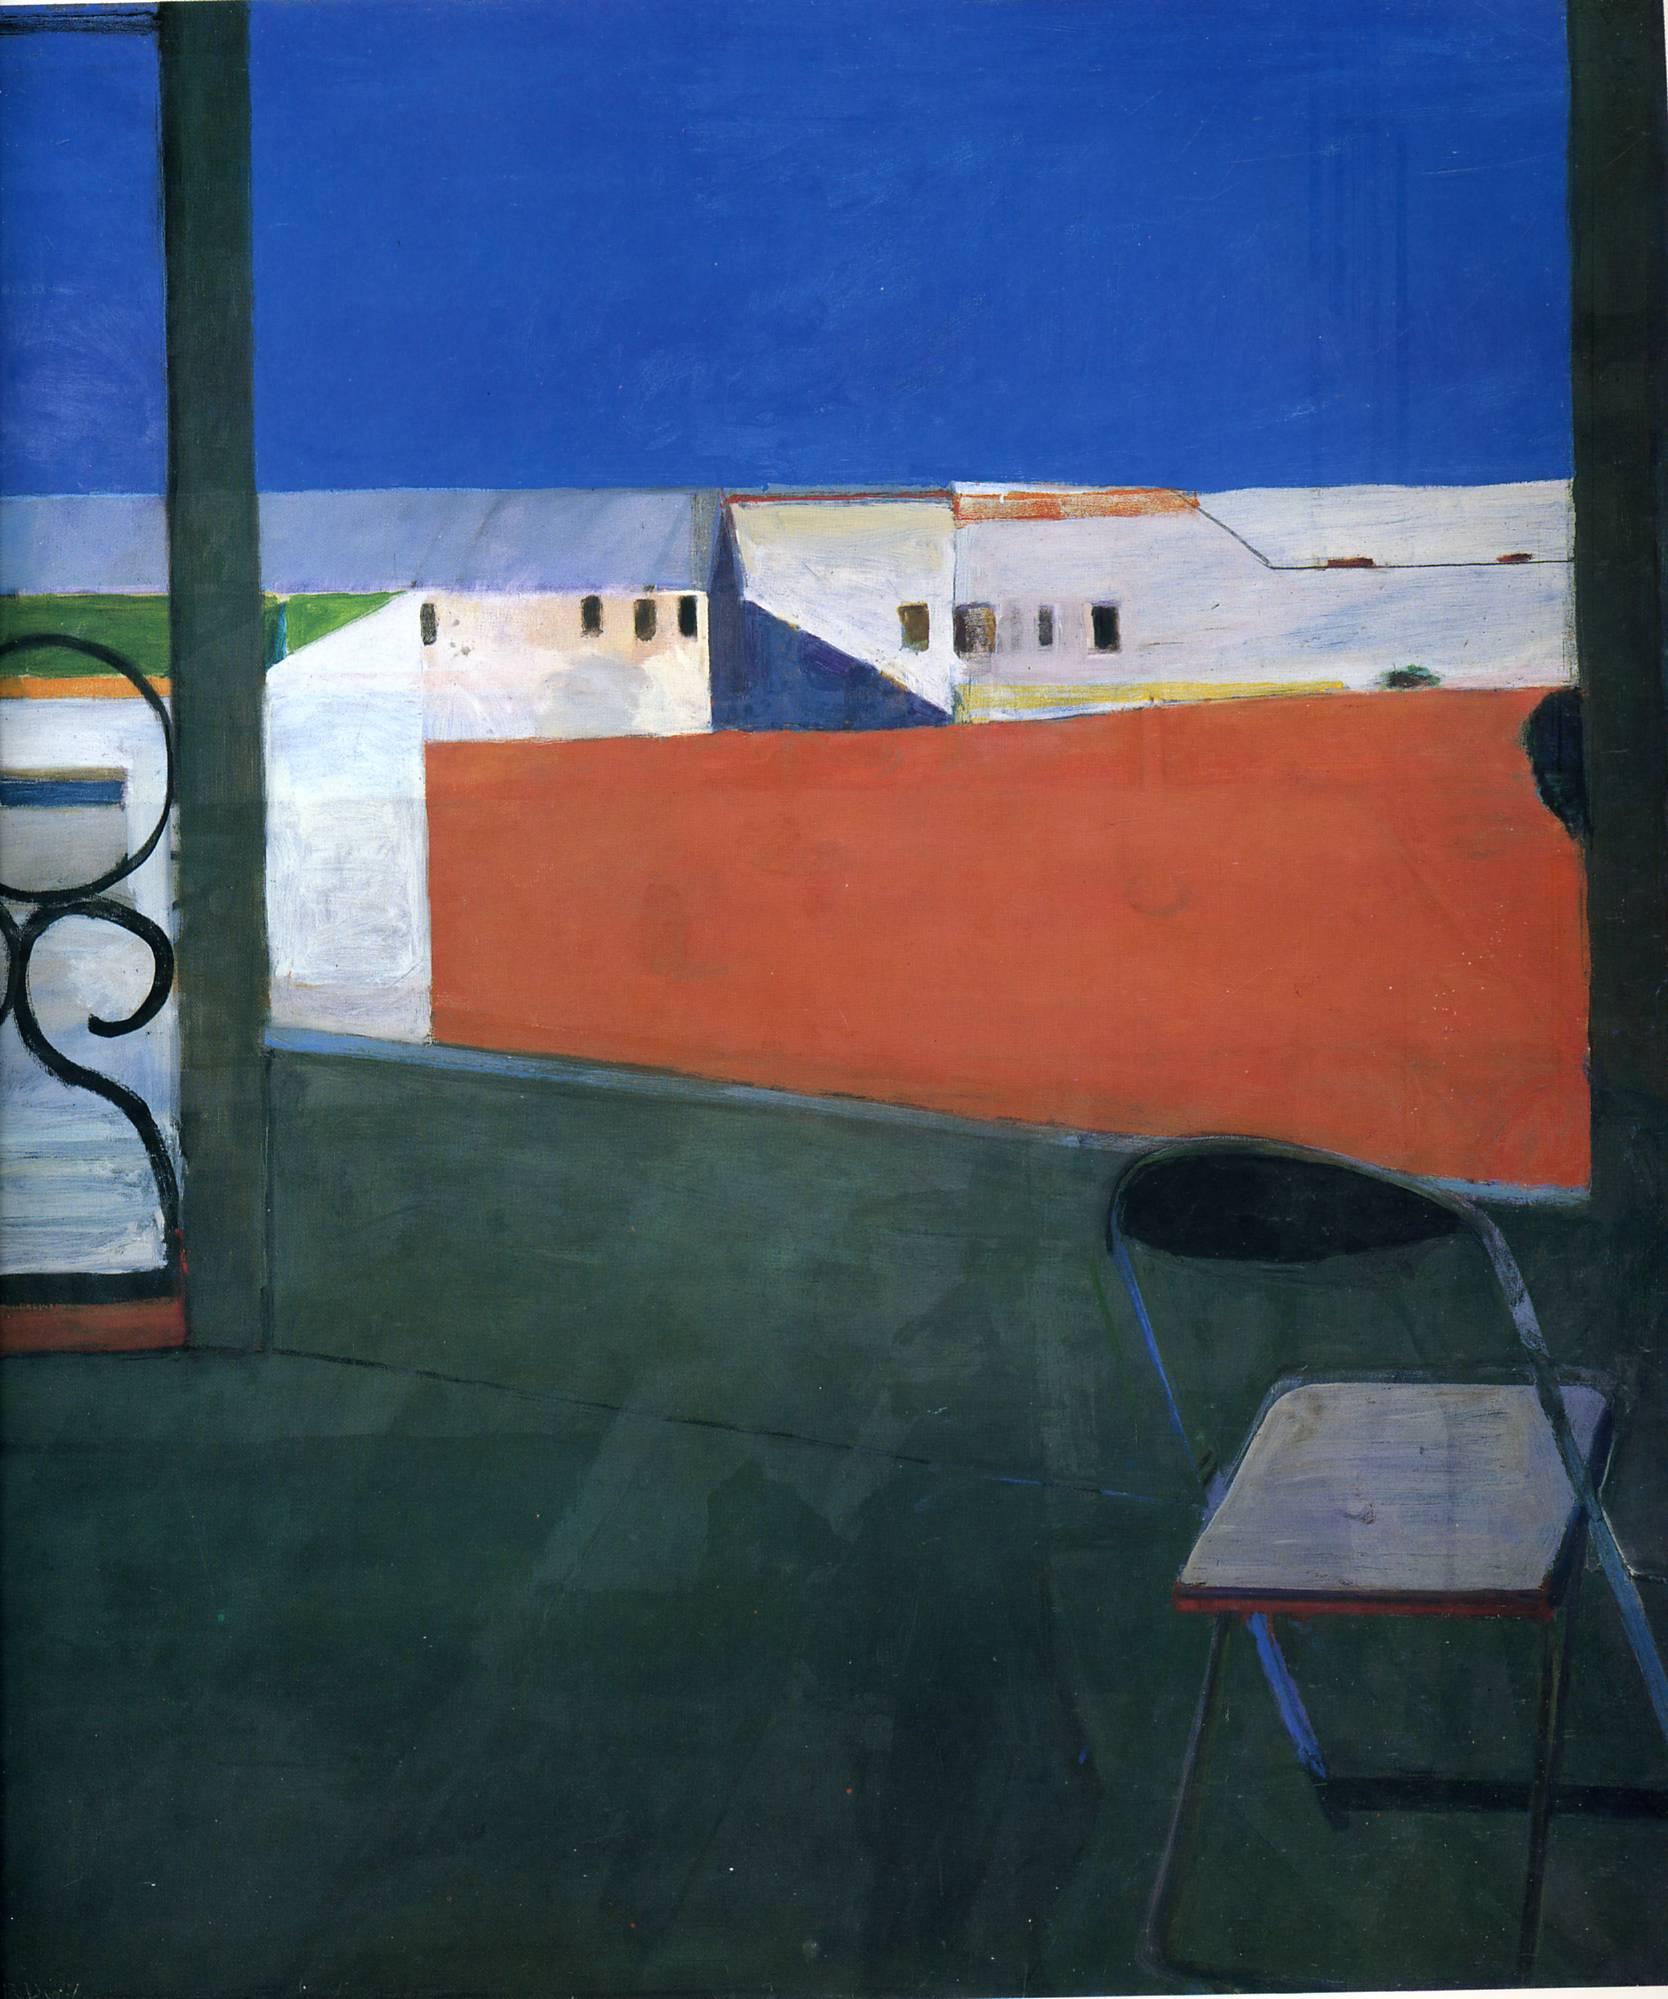 Richard Diebenkorn had a genius for conveying the simple  The    Richard Diebenkorn Paintings